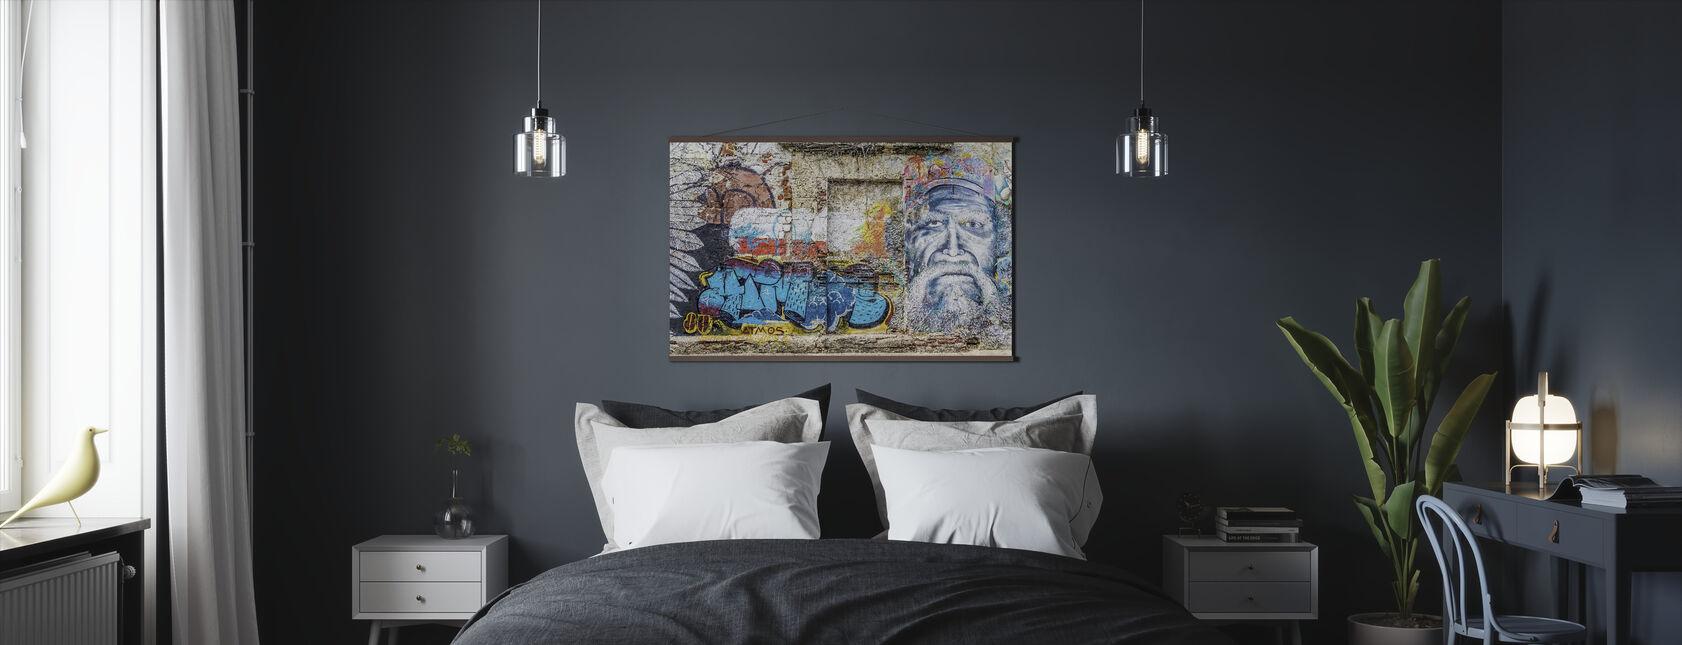 Wall Graffiti - Plakat - Soveværelse